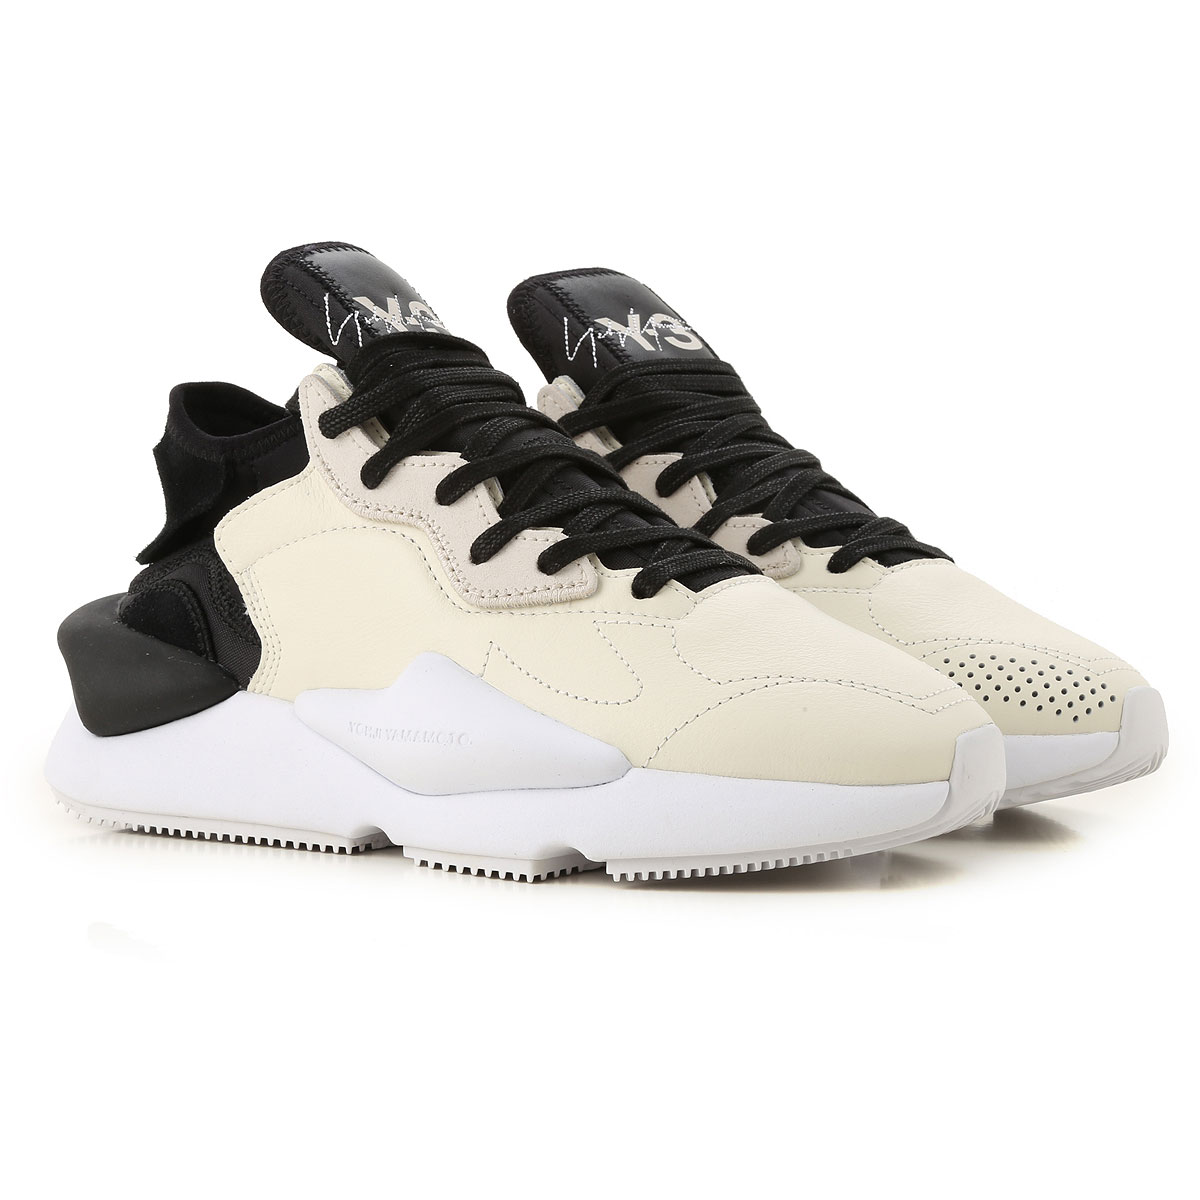 Y3 by Yohji Yamamoto Sneakers for Women On Sale, Black, Leather, 2019, 5 5.5 5.5 6 6.5 7 8.5